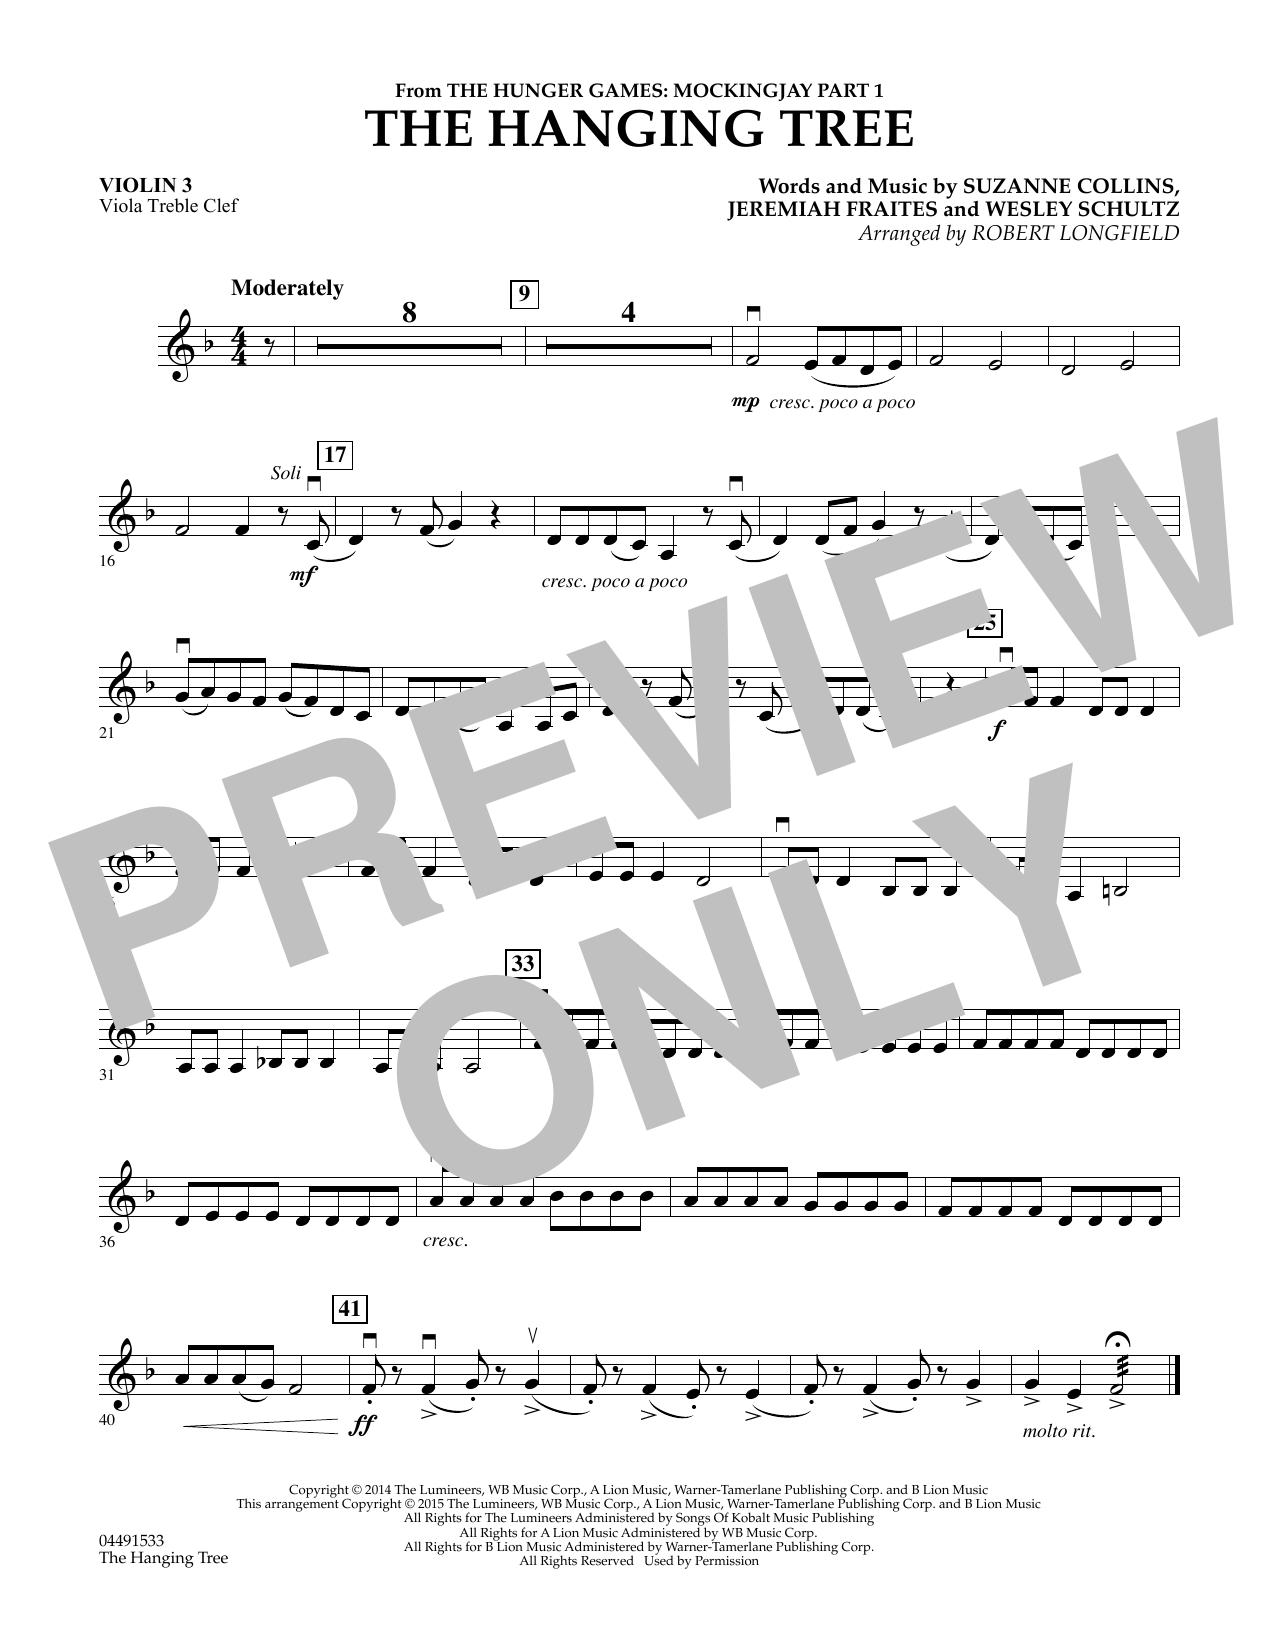 The Hanging Tree - Violin 3 (Viola T.C.) (Orchestra)